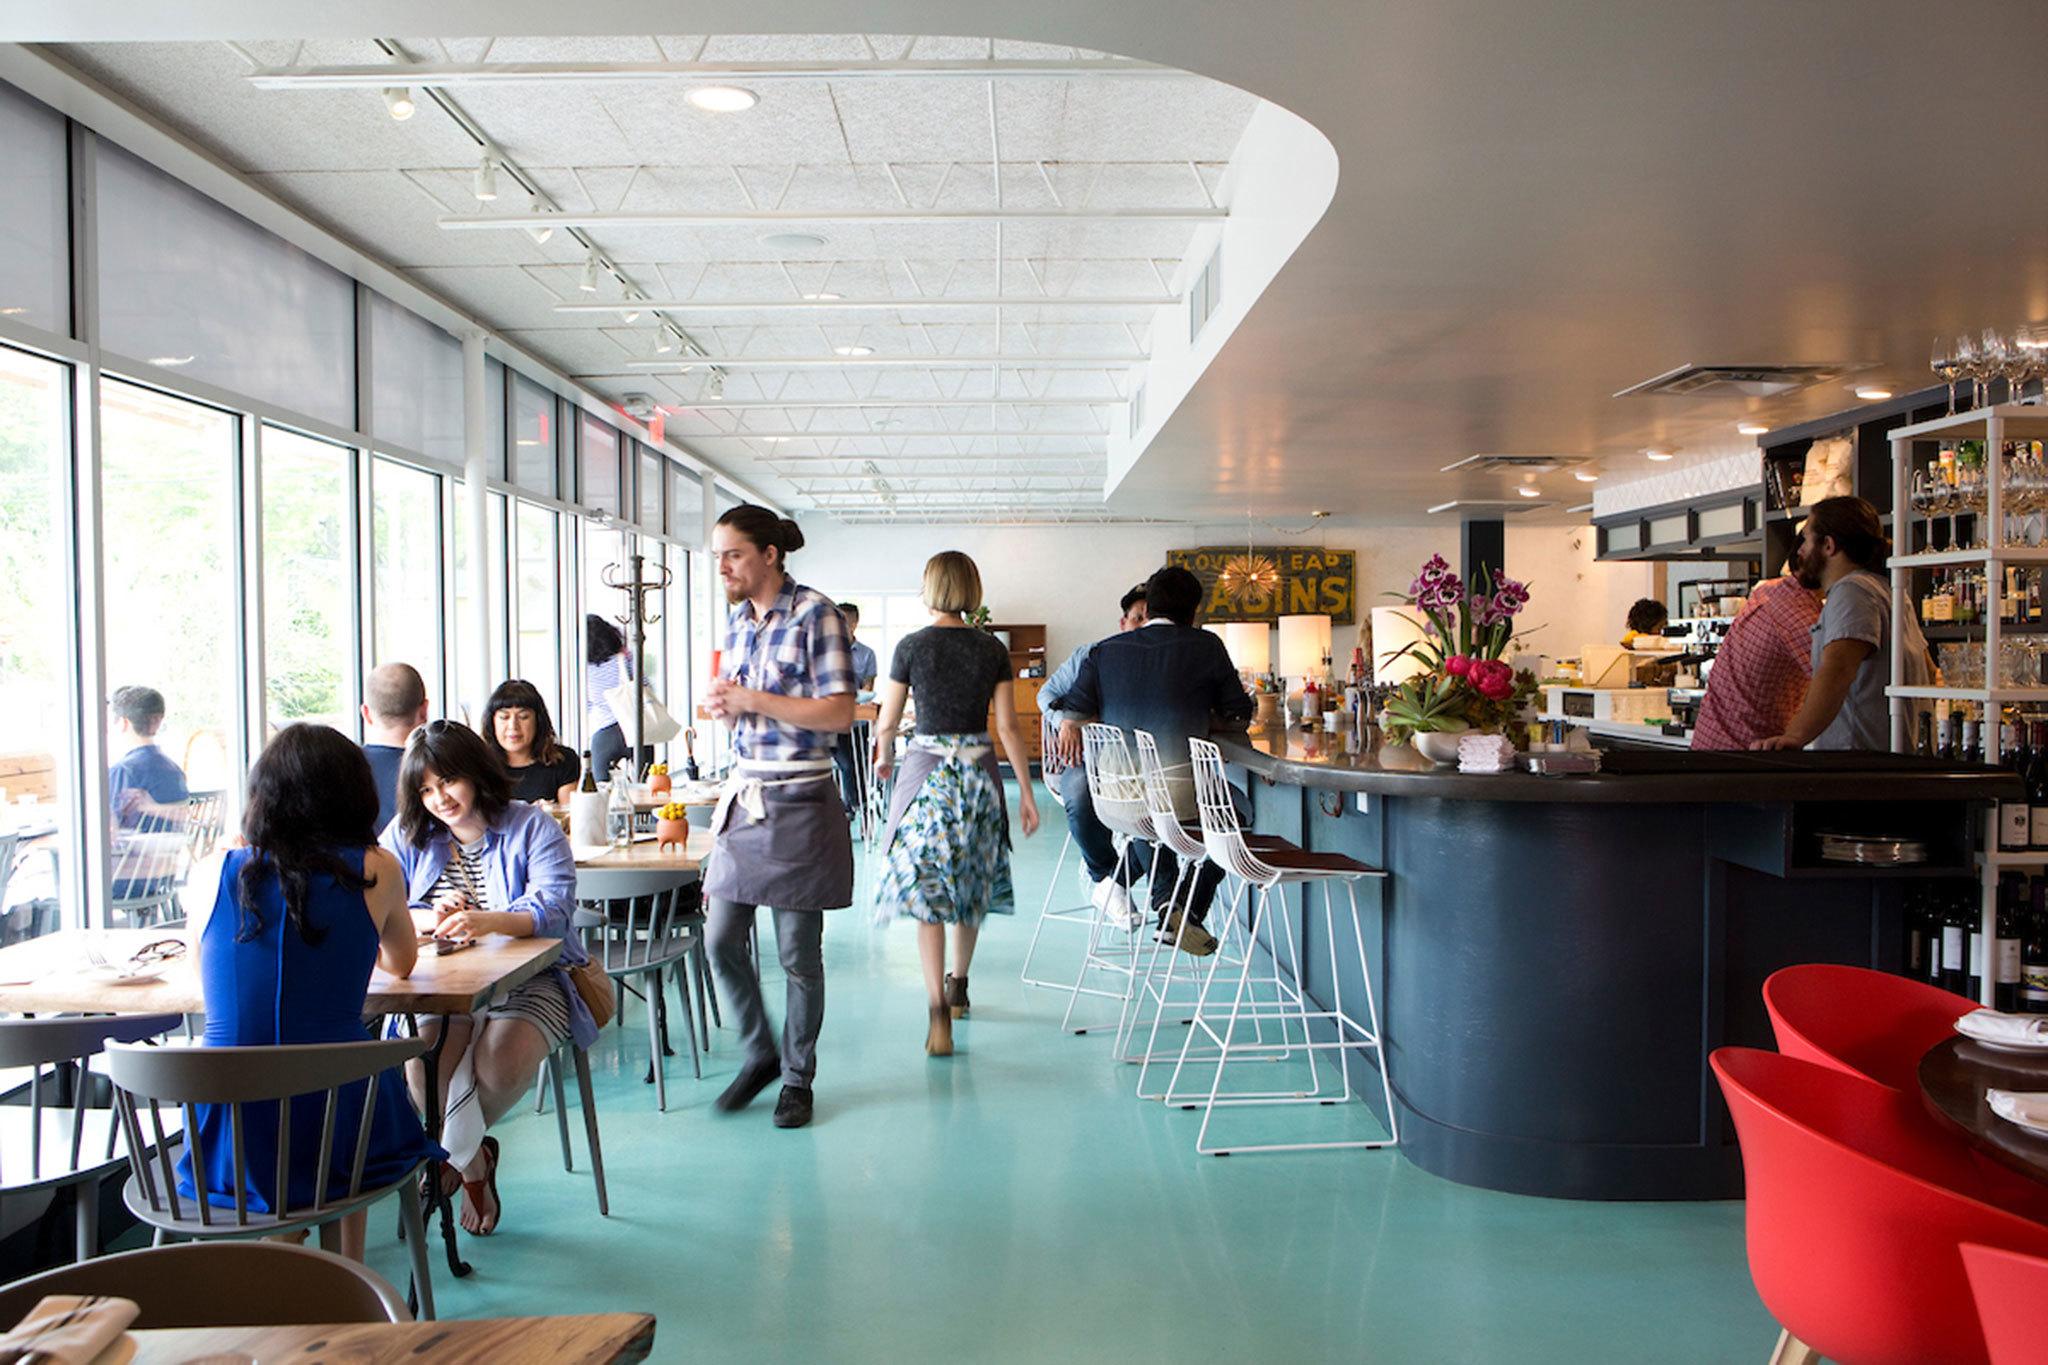 Launderette's Rene Ortiz dishes on ugly restaurants and heartburn